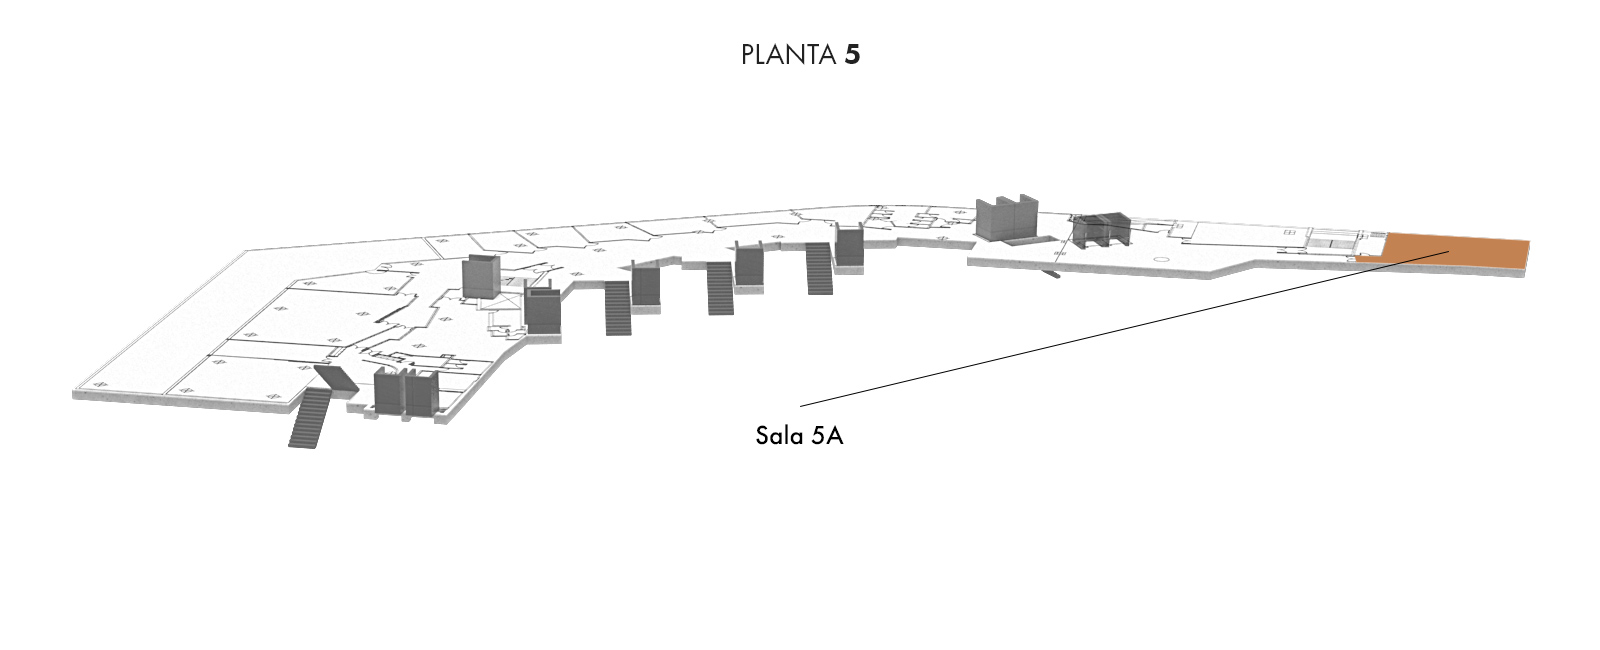 Sala 5A, Planta 5 | Palacio Euskalduna Jauregia